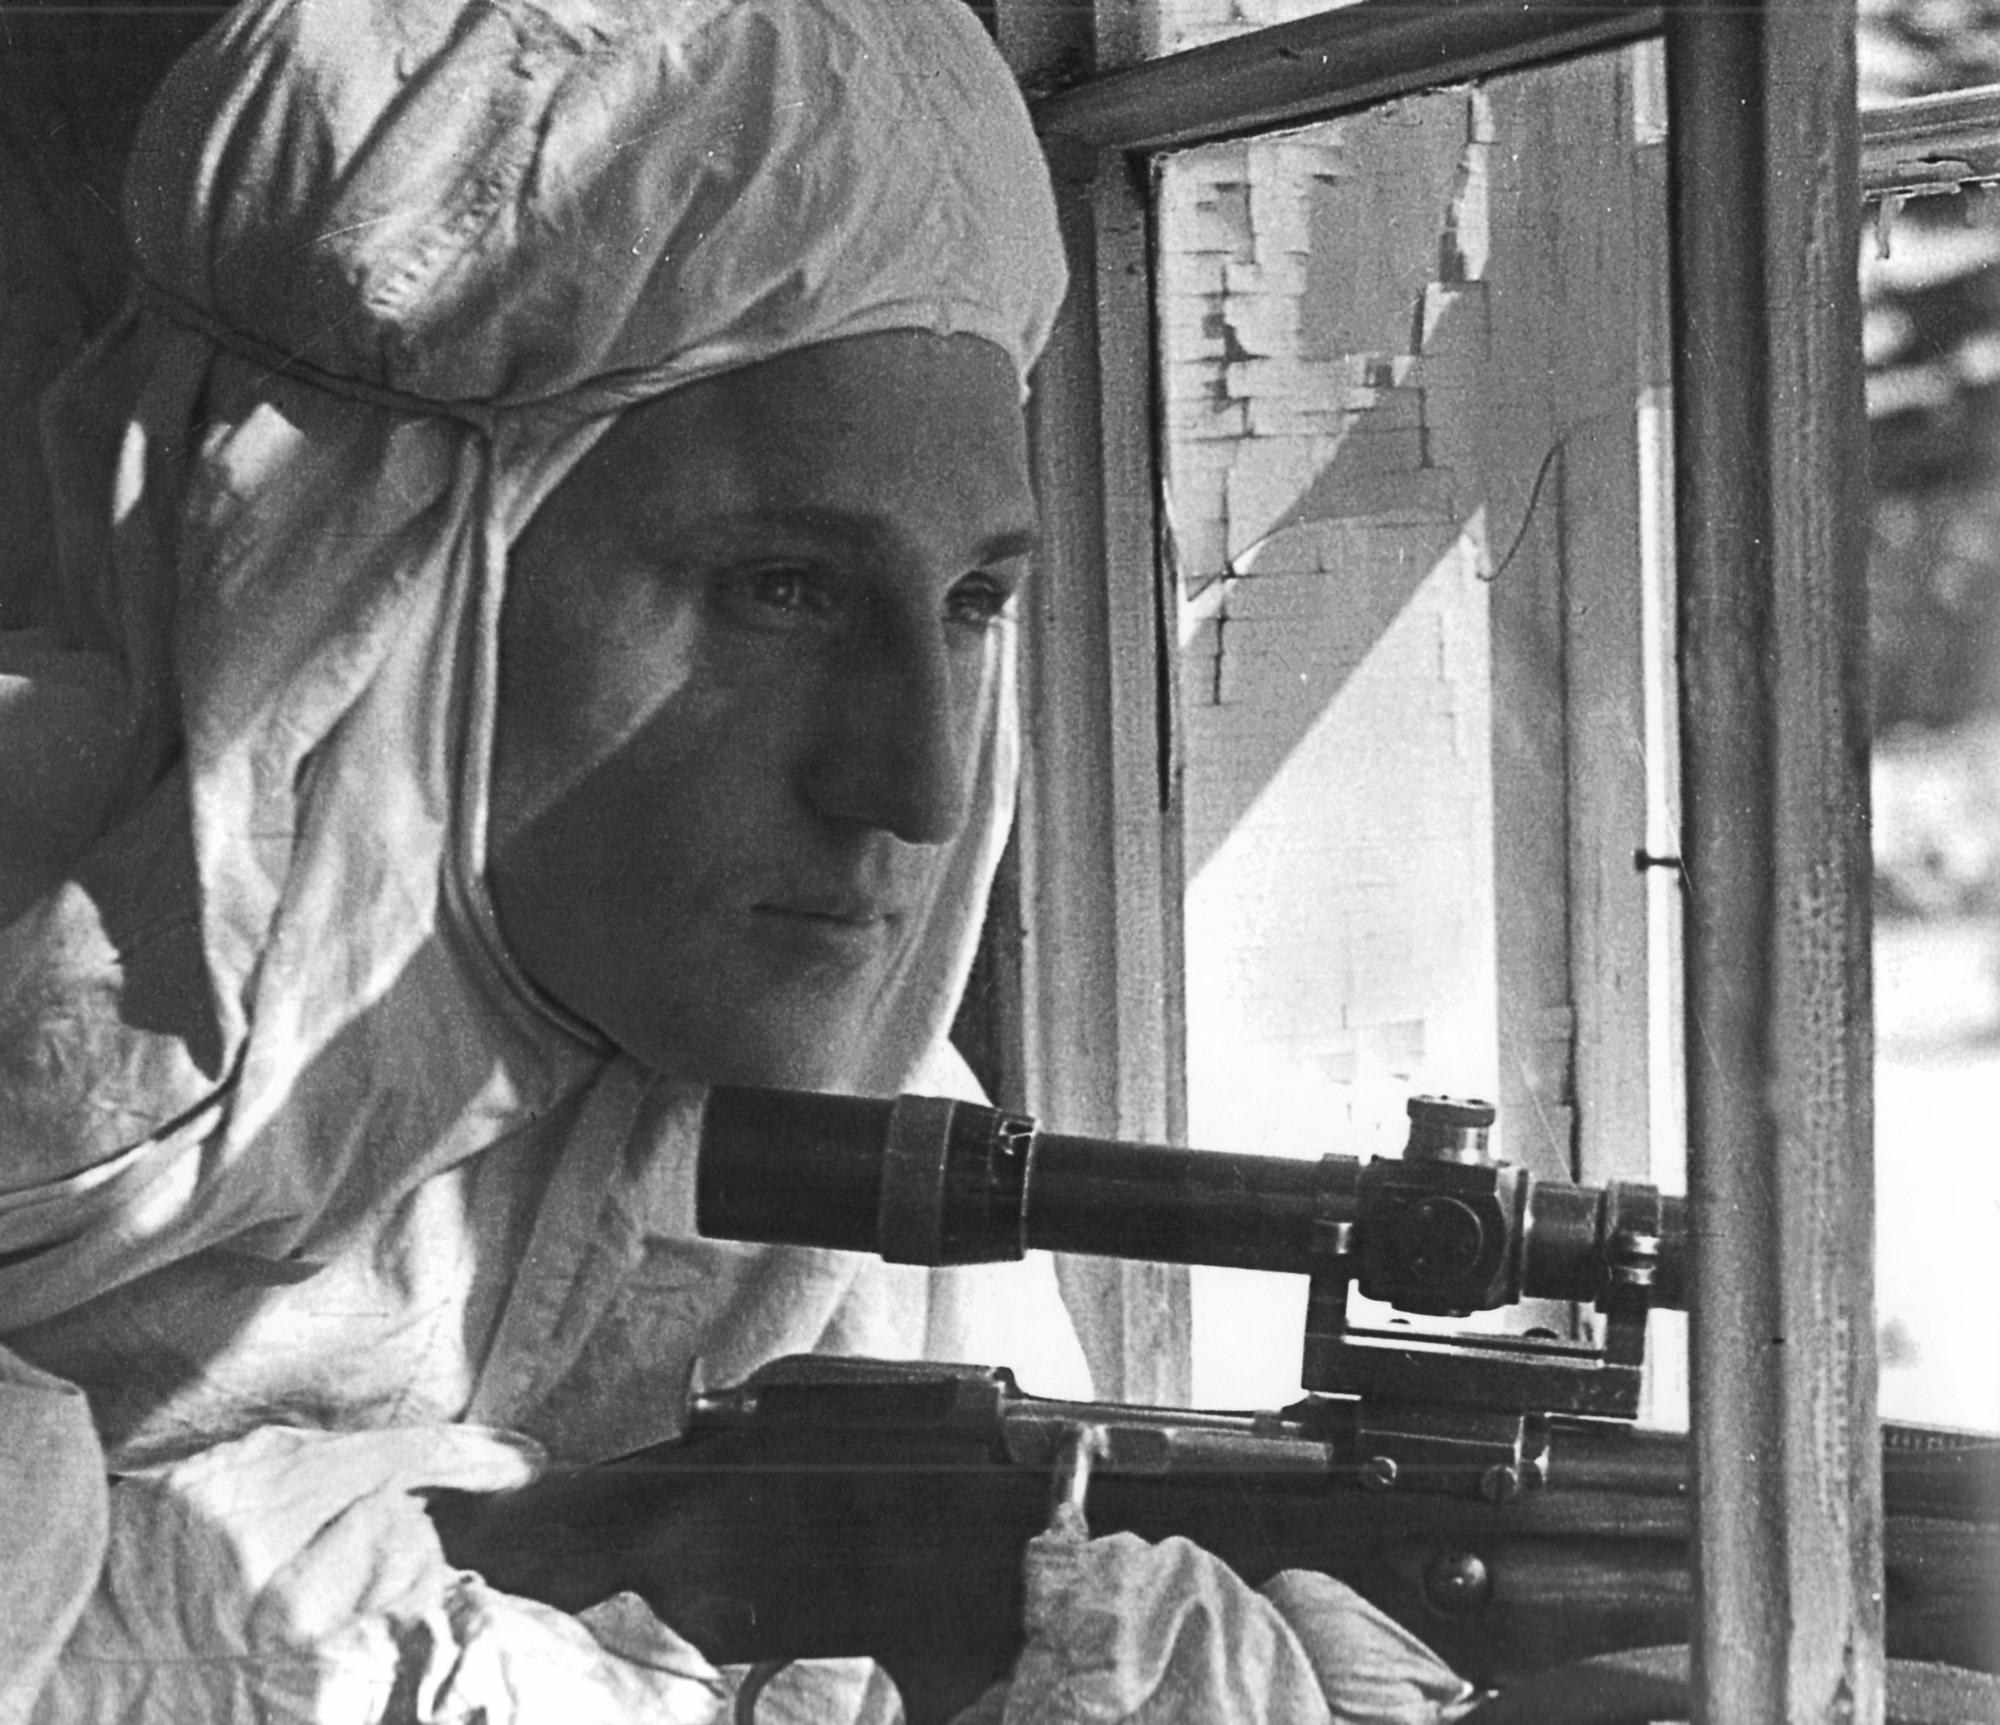 Советский снайпер у окна на Ленинградском фронте. Март 1943